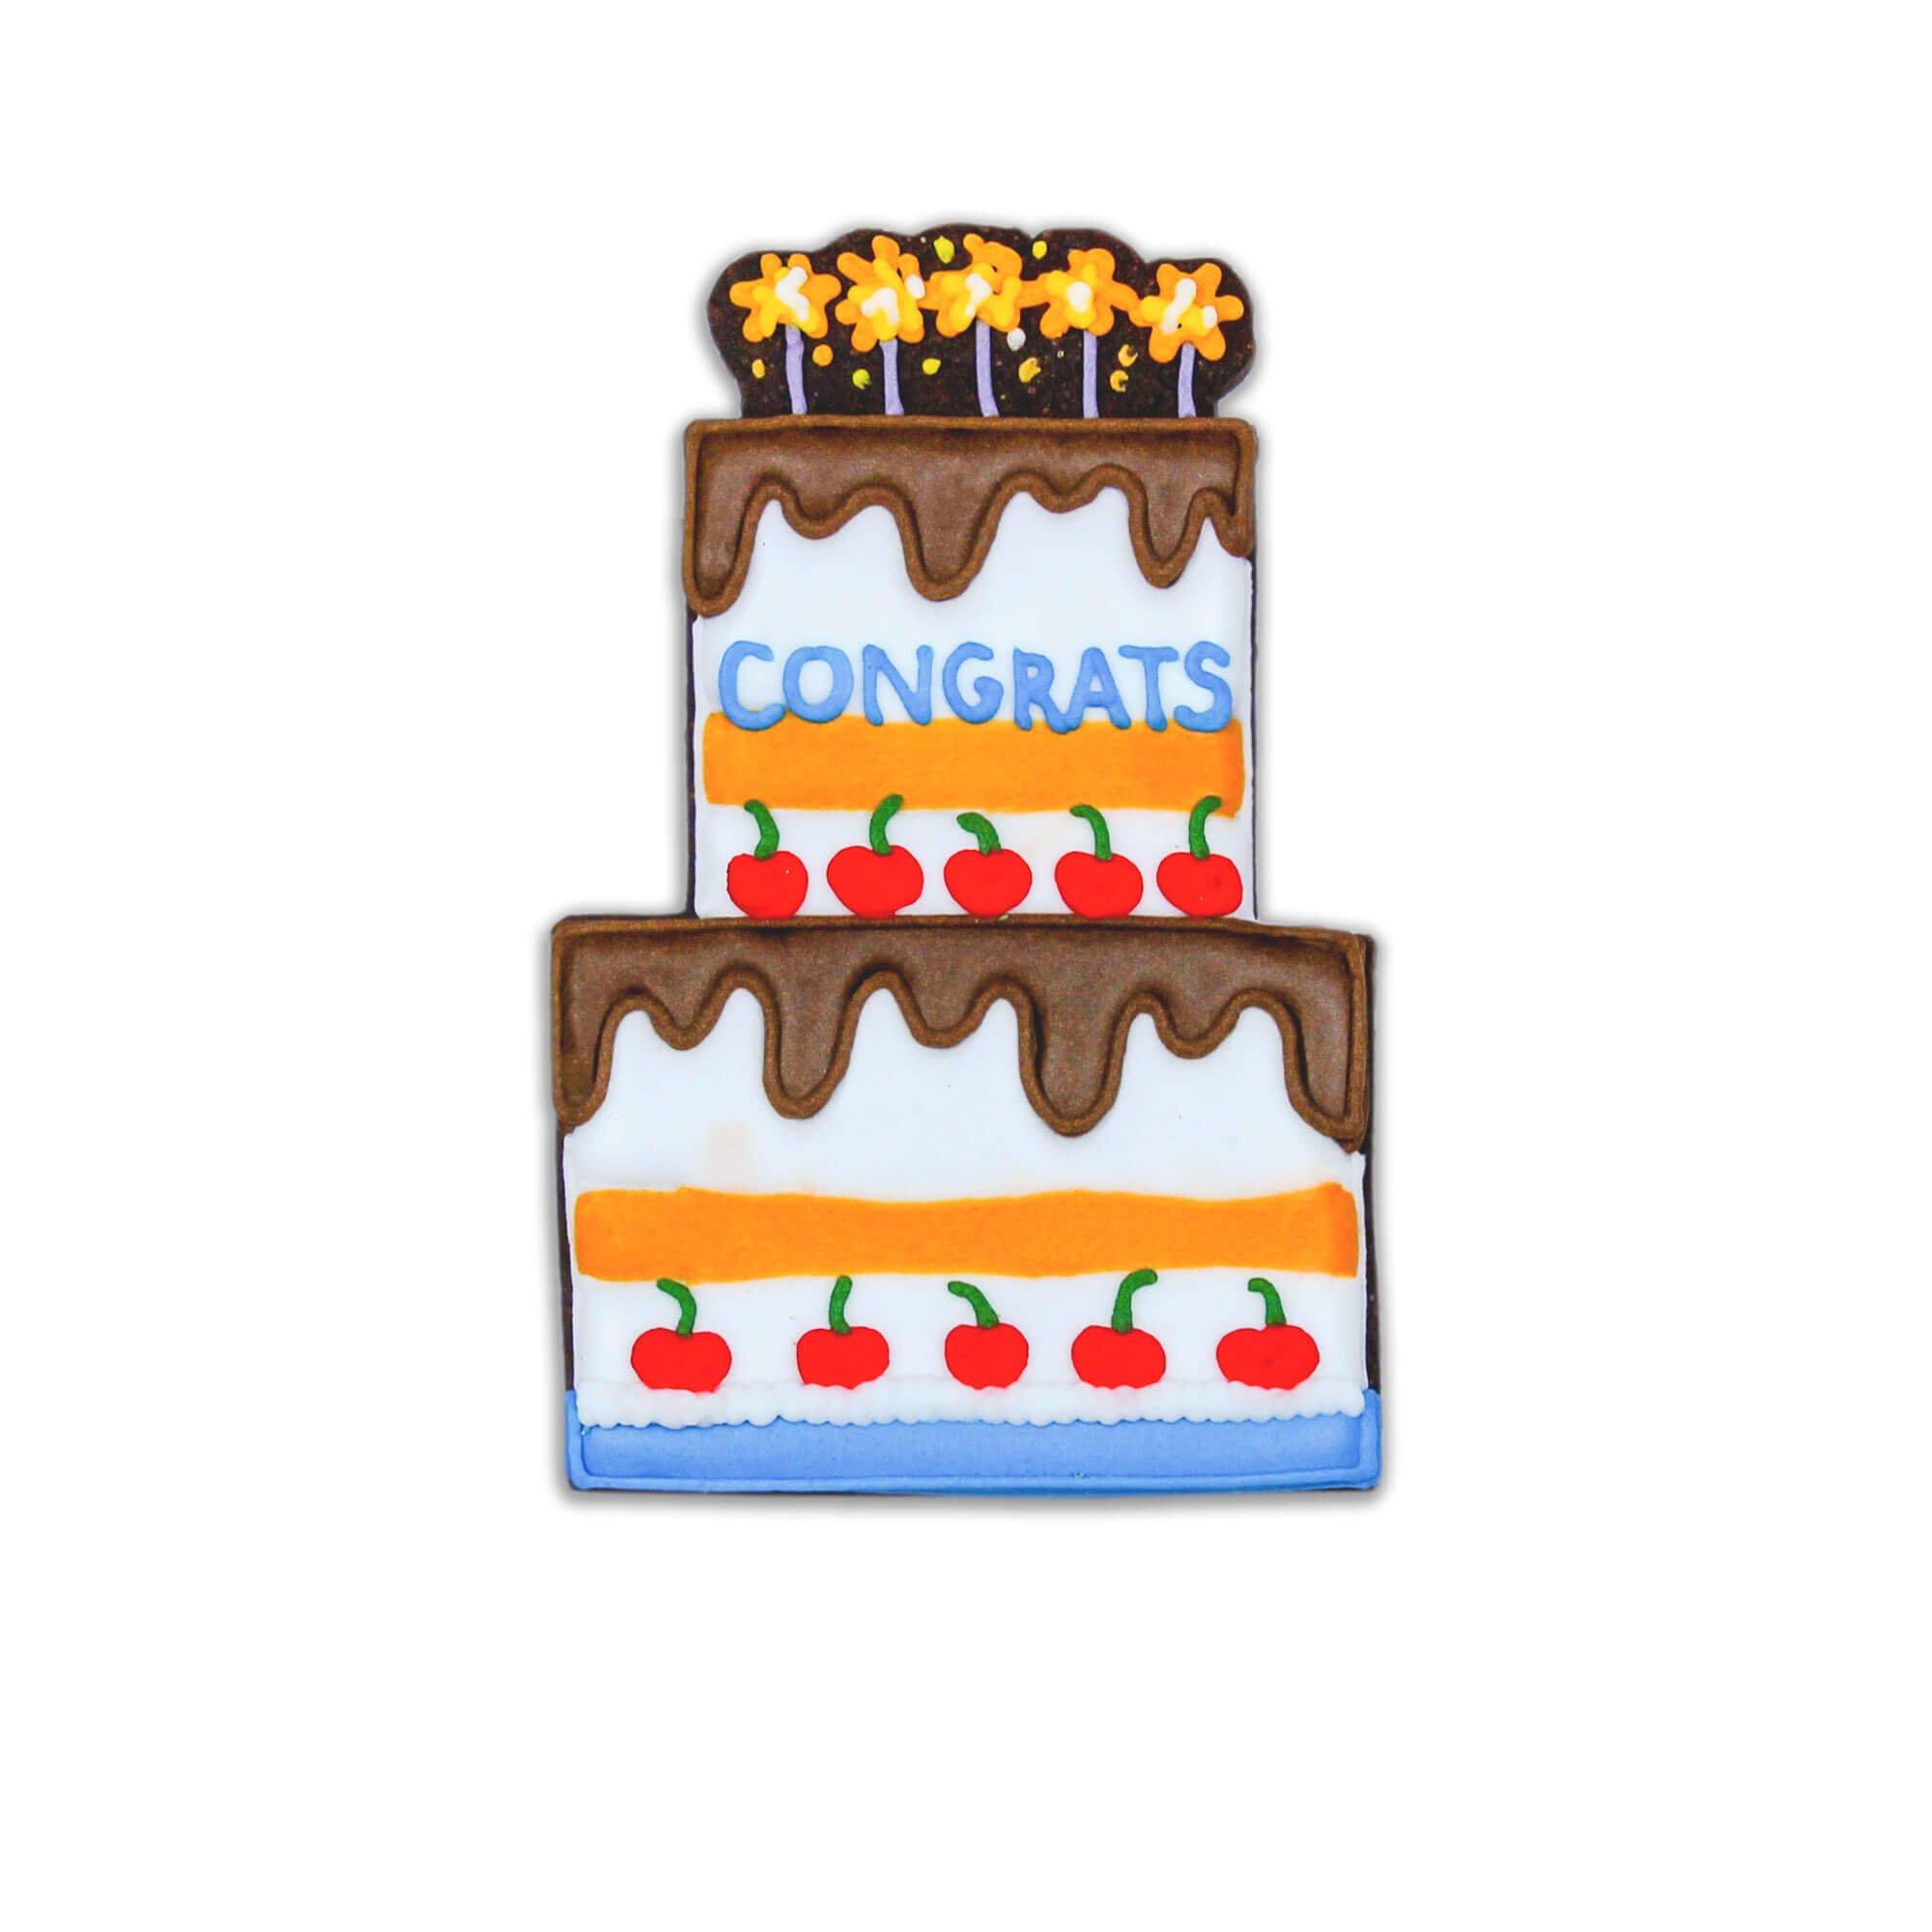 congrats cake biscuit individual